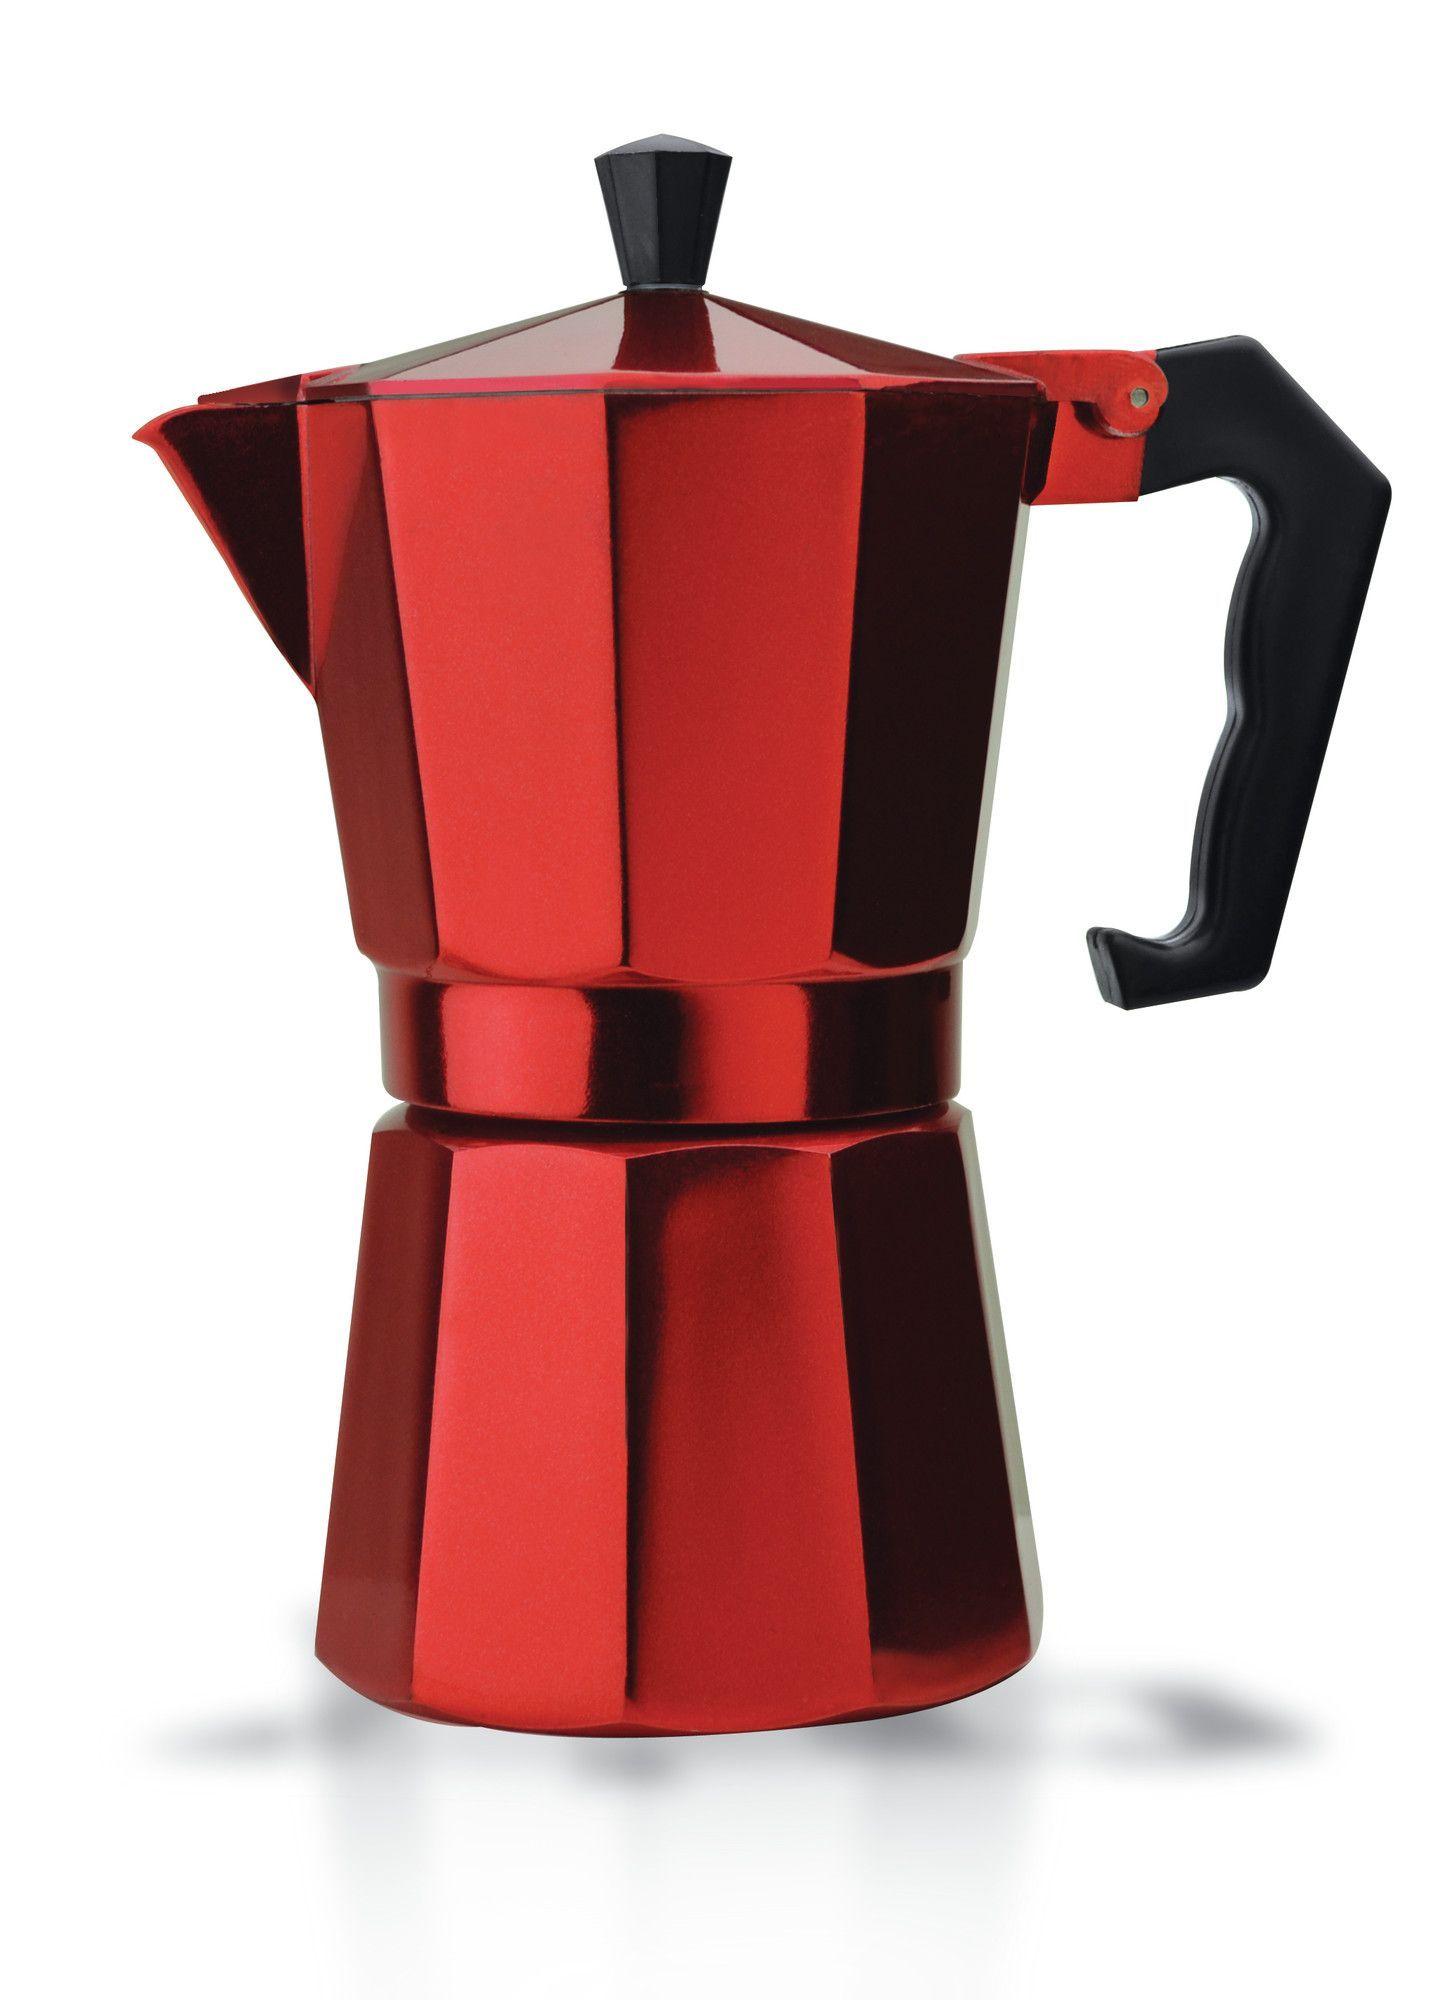 Home Thermal coffee maker, Best coffee maker, Best drip